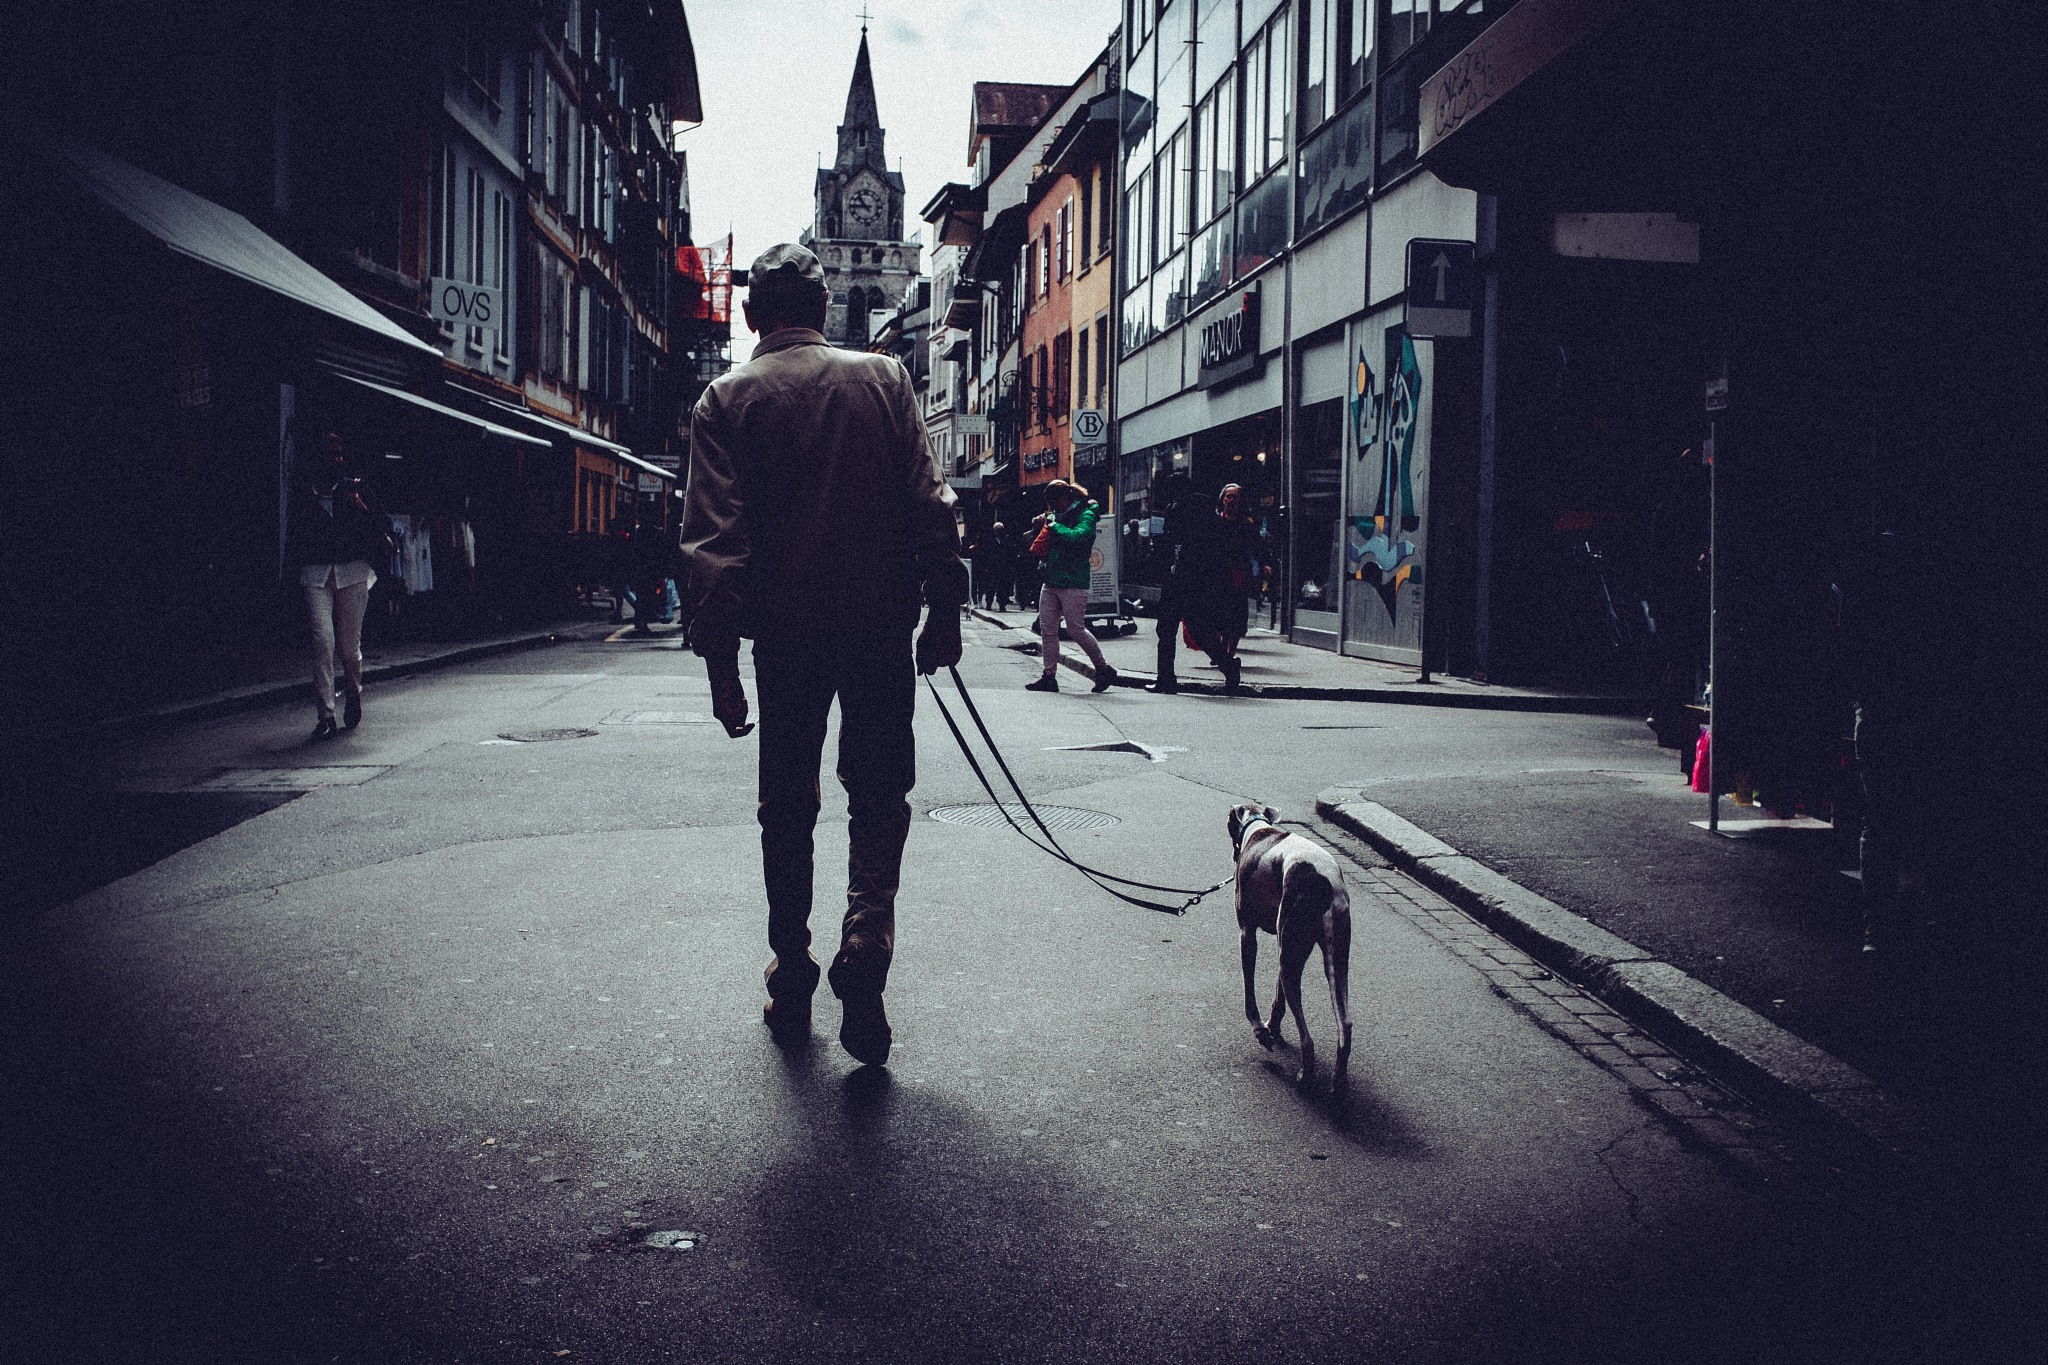 I walk a lonely road by Cris Estalayo